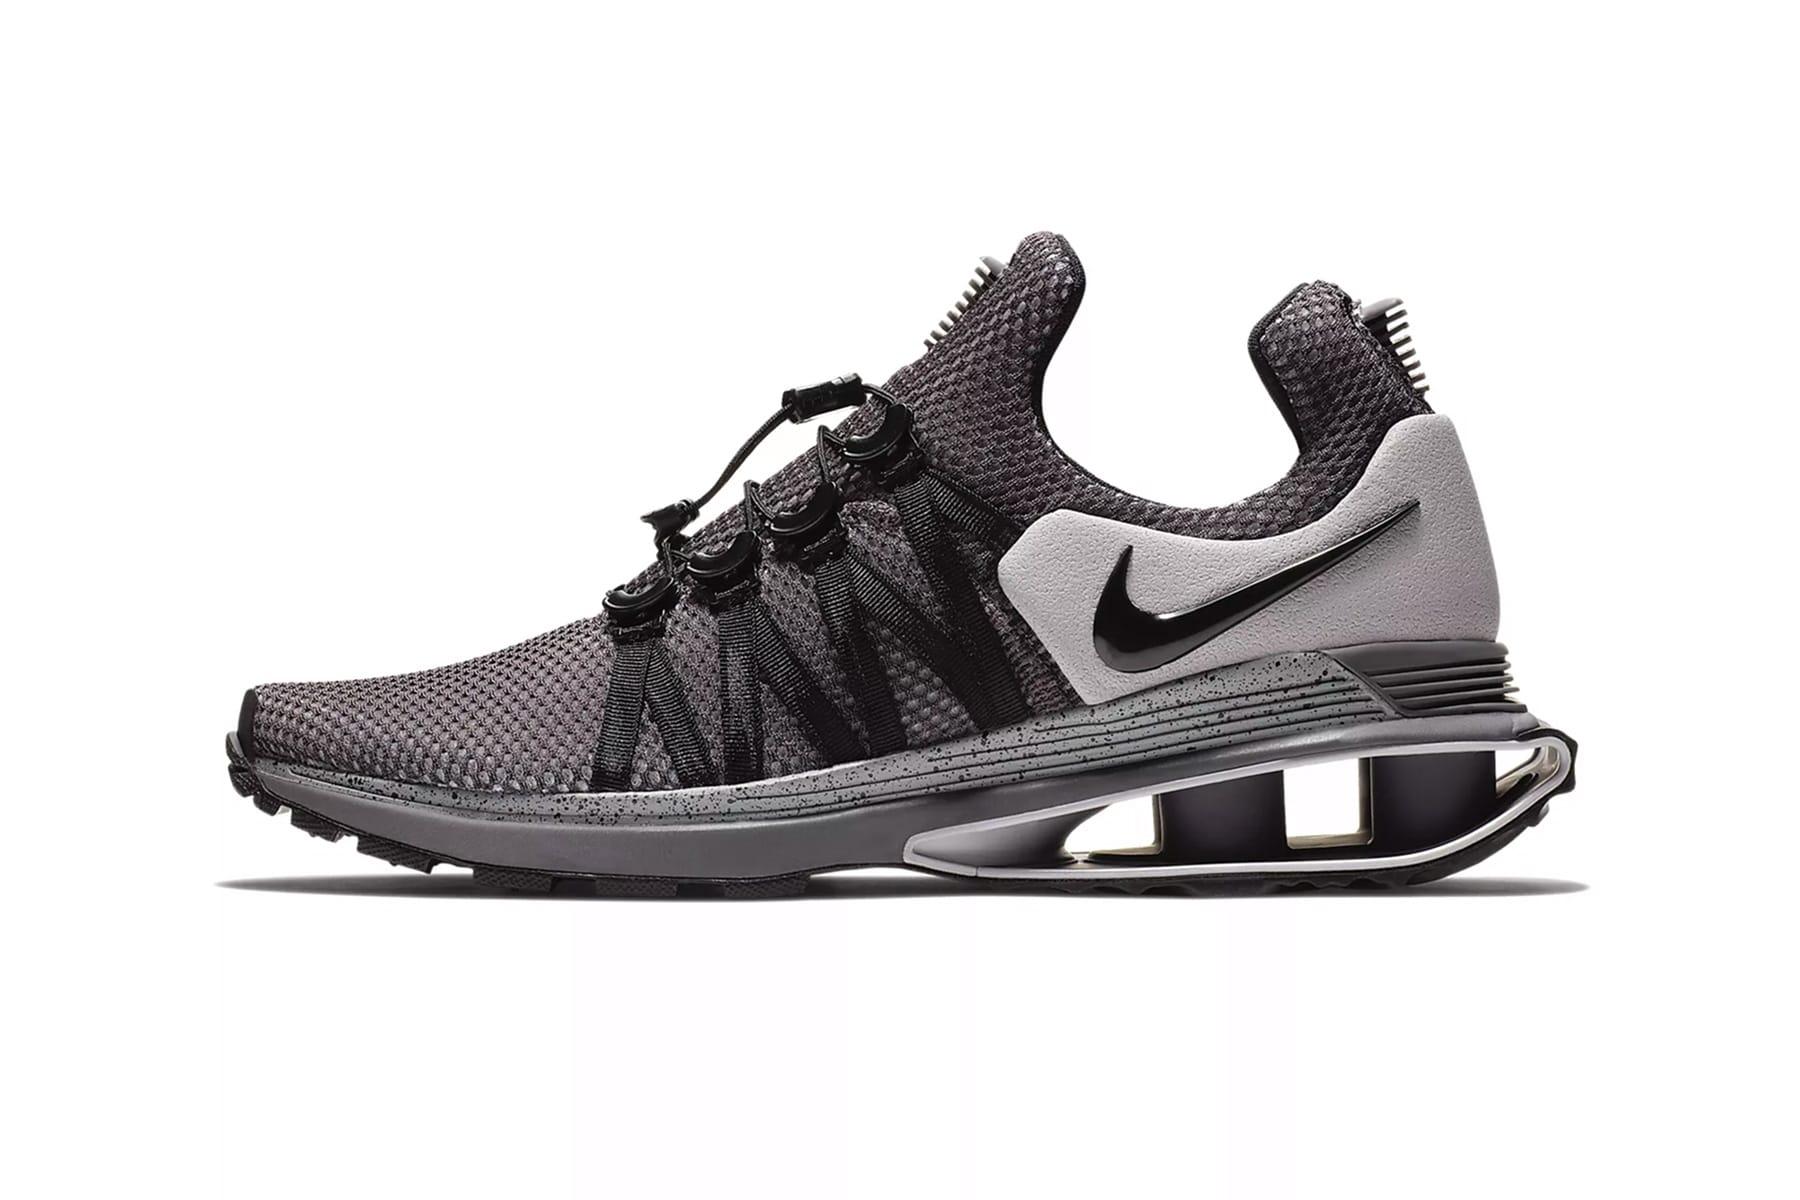 Nike Shox Gravity Summer New Colorways